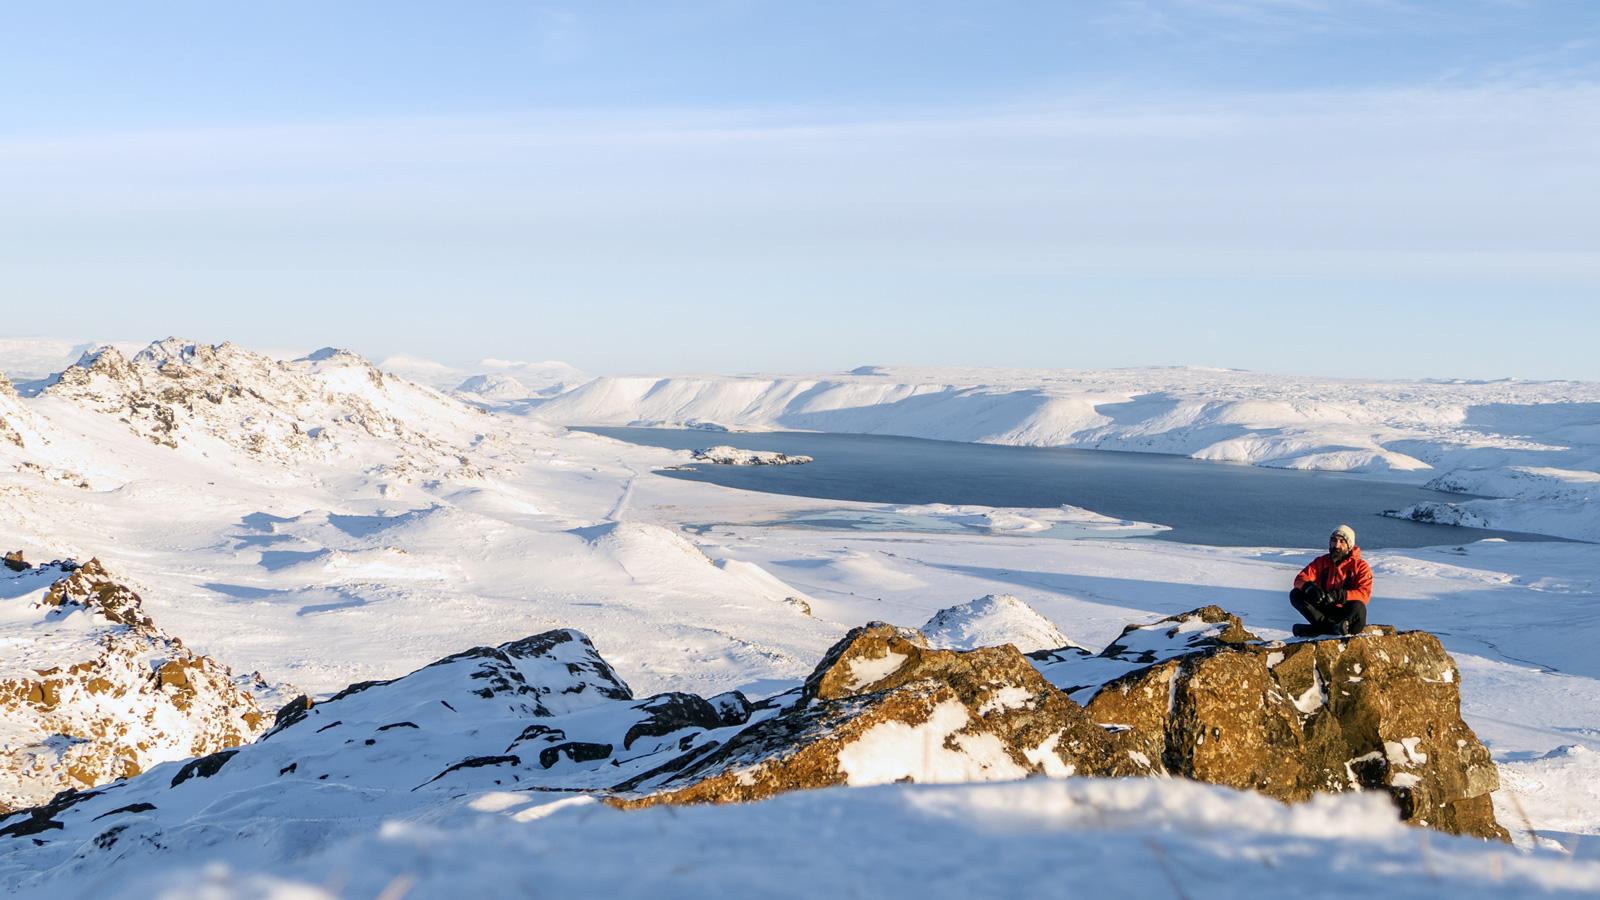 circuit Islande, randonnée sur la péninsule de Reykjavík en hiver